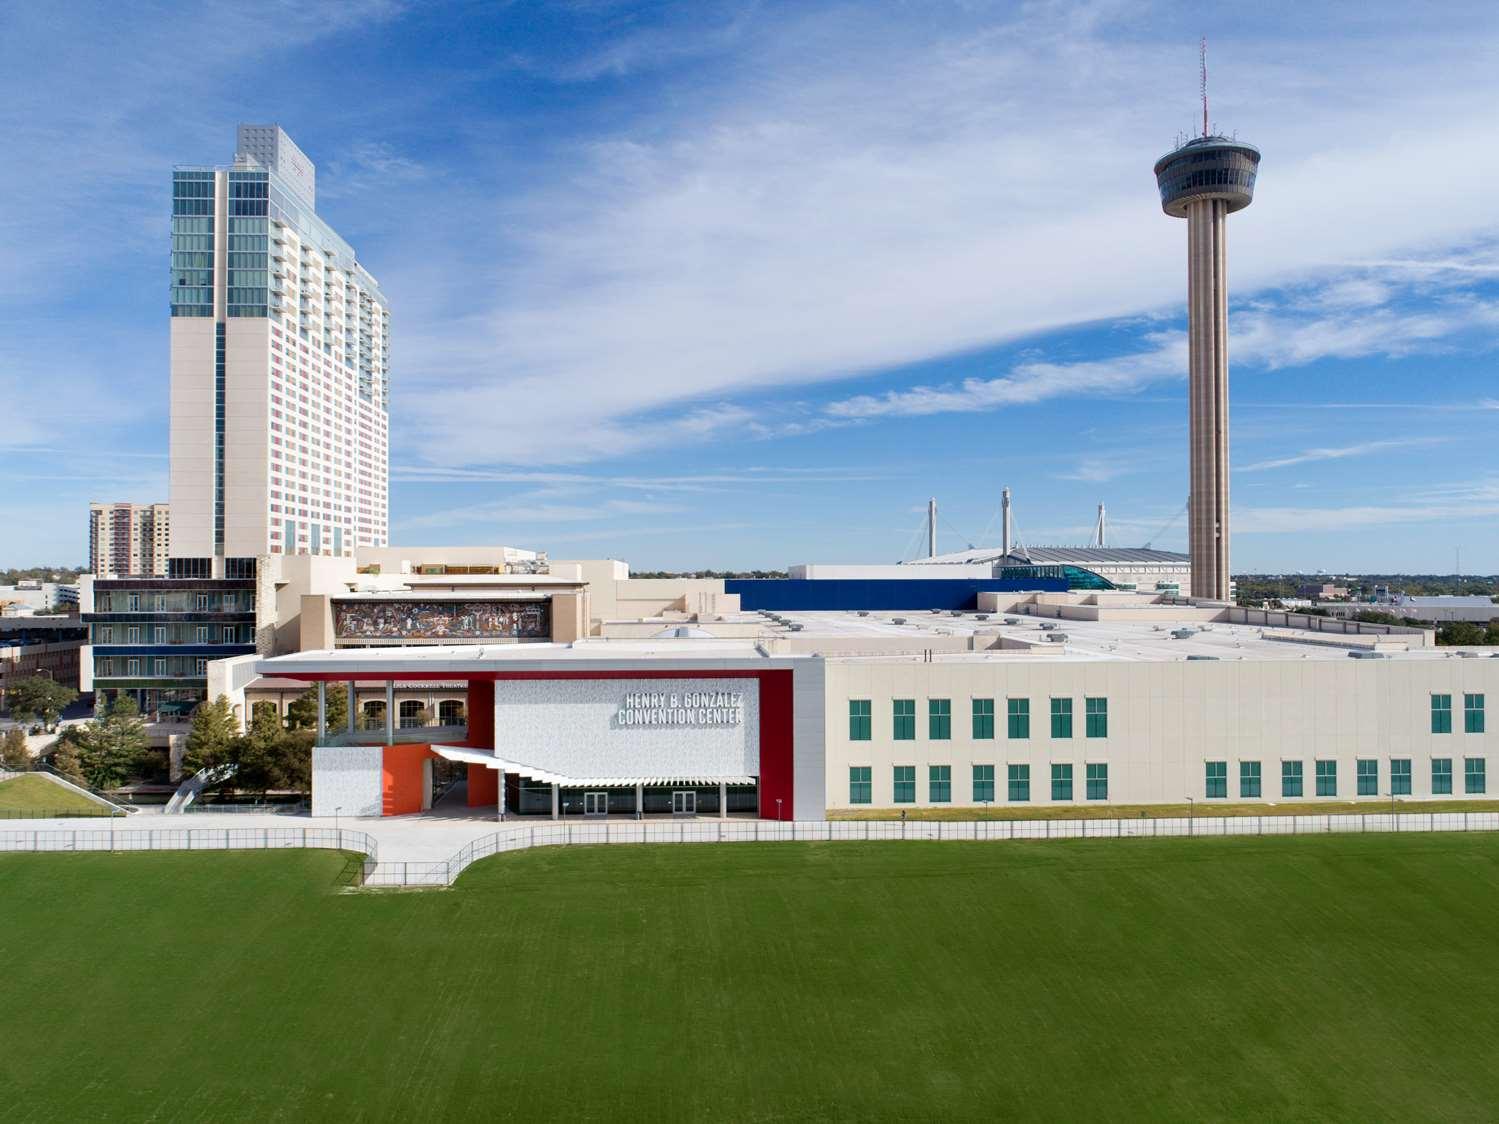 Exterior view - Grand Hyatt Hotel San Antonio